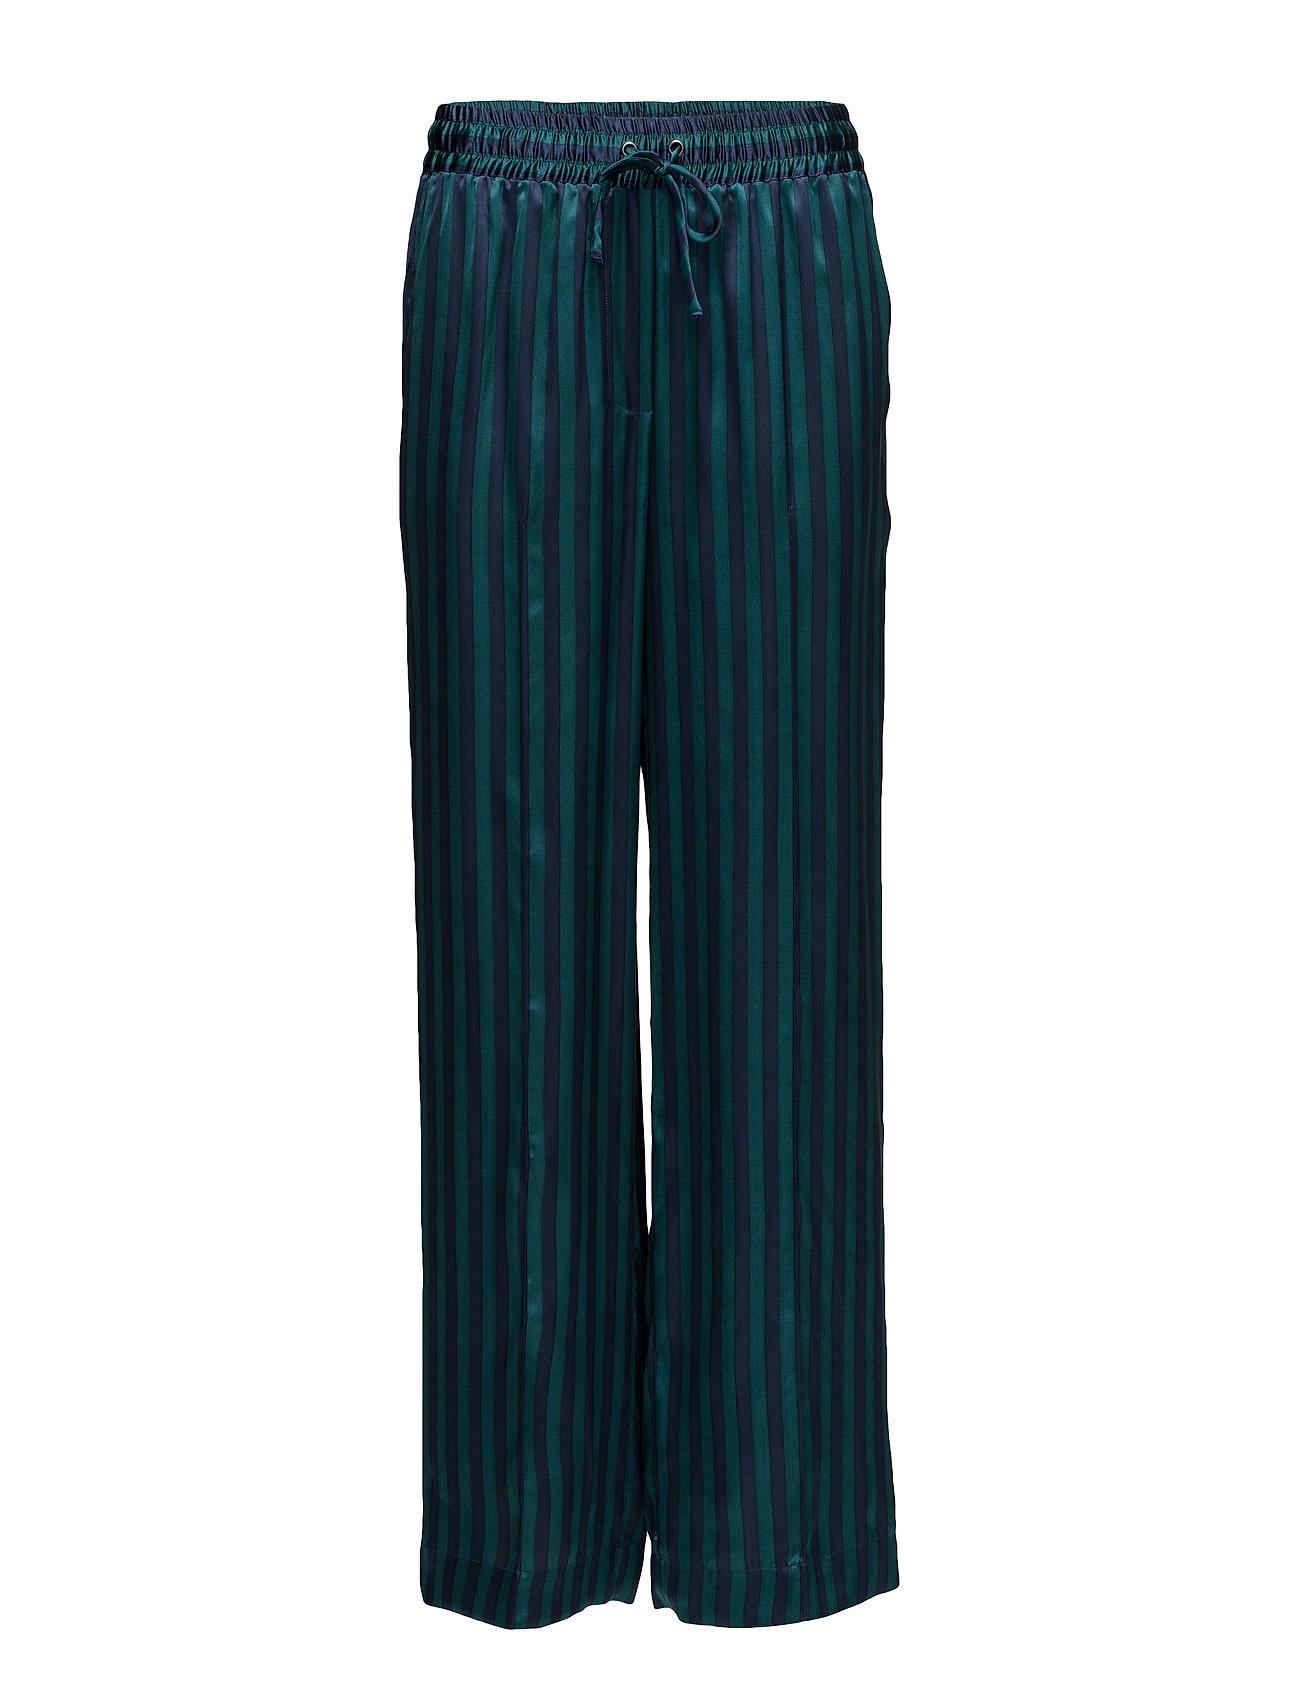 Lovechild 1979 Malin Pants